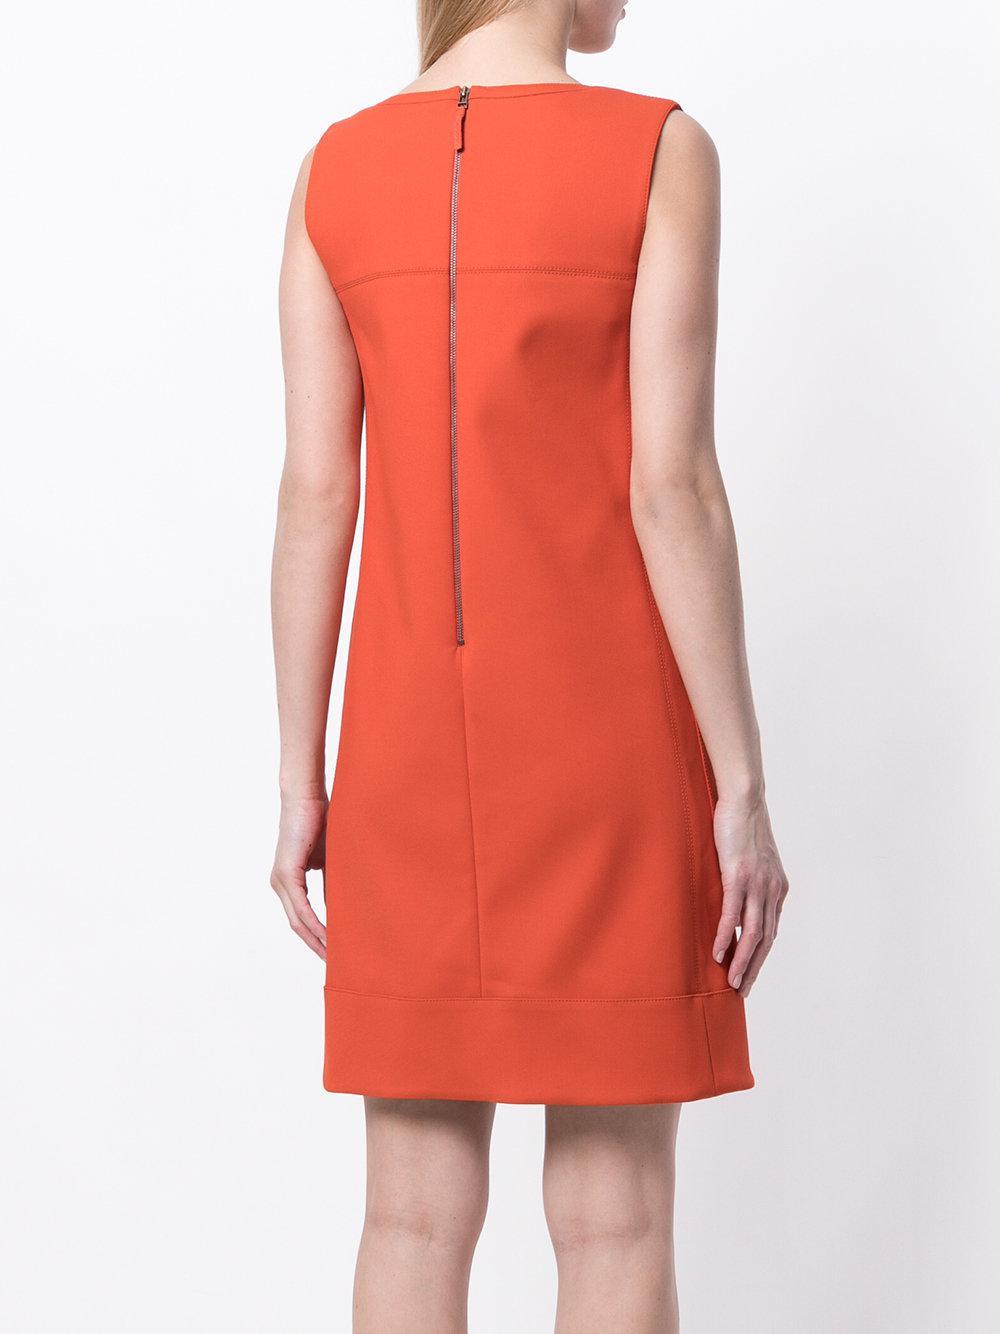 Good Service Brand New Unisex Online classic shift dress - Yellow & Orange Paule Ka Buy Cheap 2018 New Sale Sast 3eKMZVdw